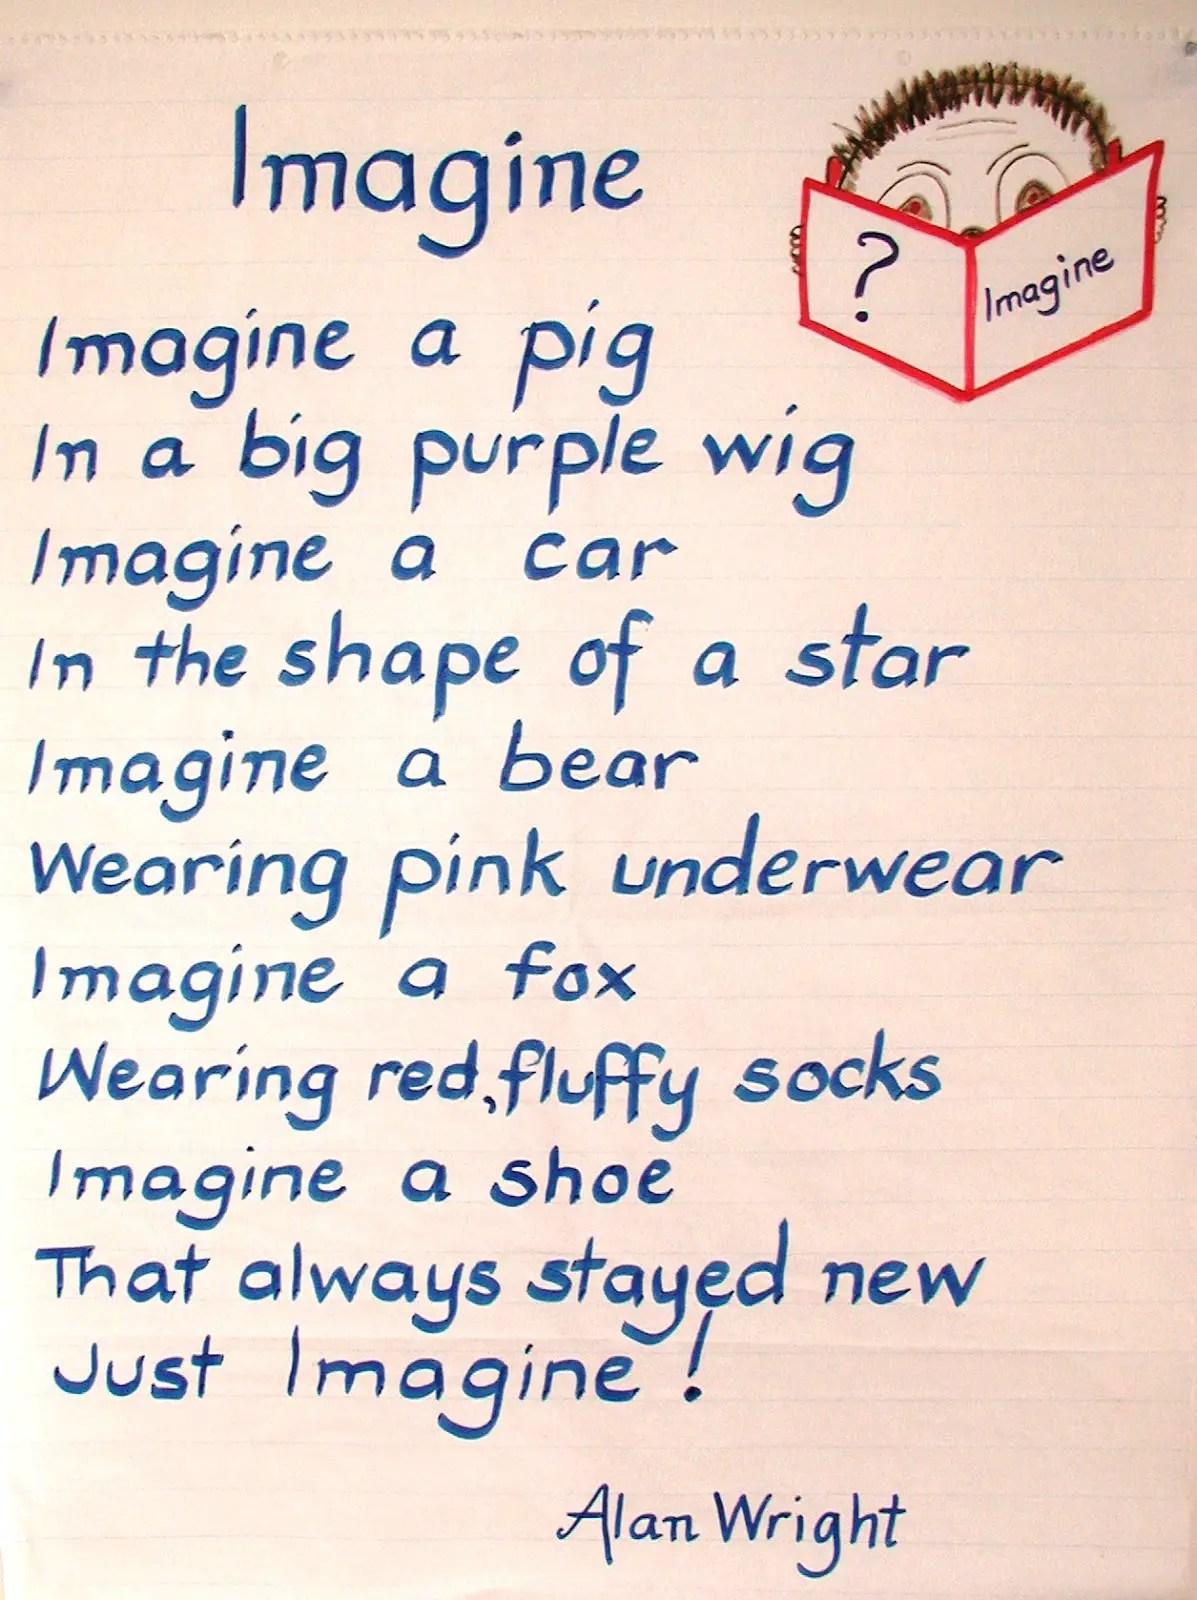 Funny Rhyming Poems : funny, rhyming, poems, Funny, Rhyming, Poems